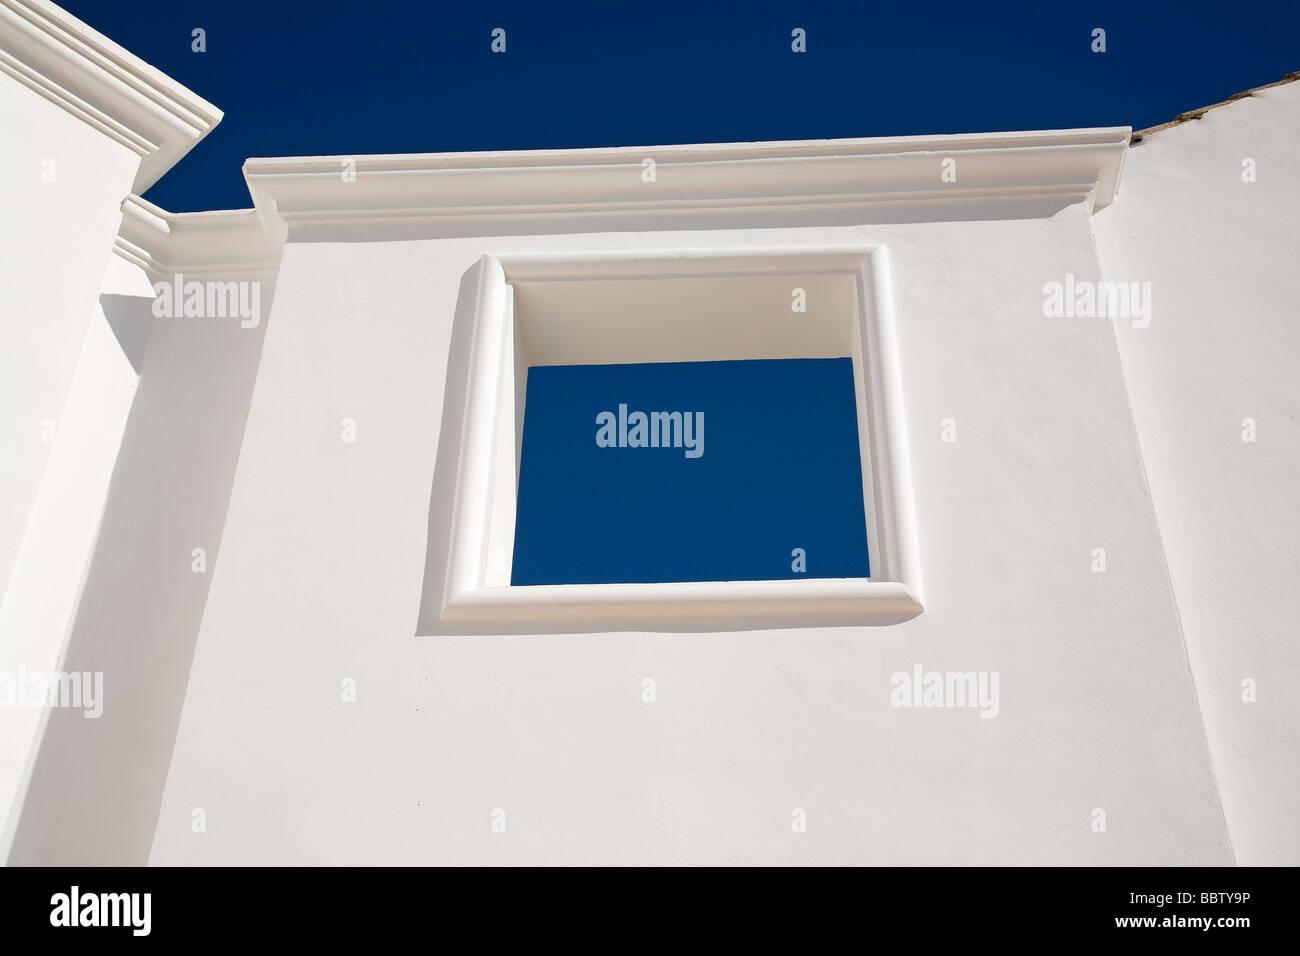 Arquitectura Paredes Blancas Cielo Azul Malaga Andalusien España Architektur weiße Wände Blau Himmel Stockbild